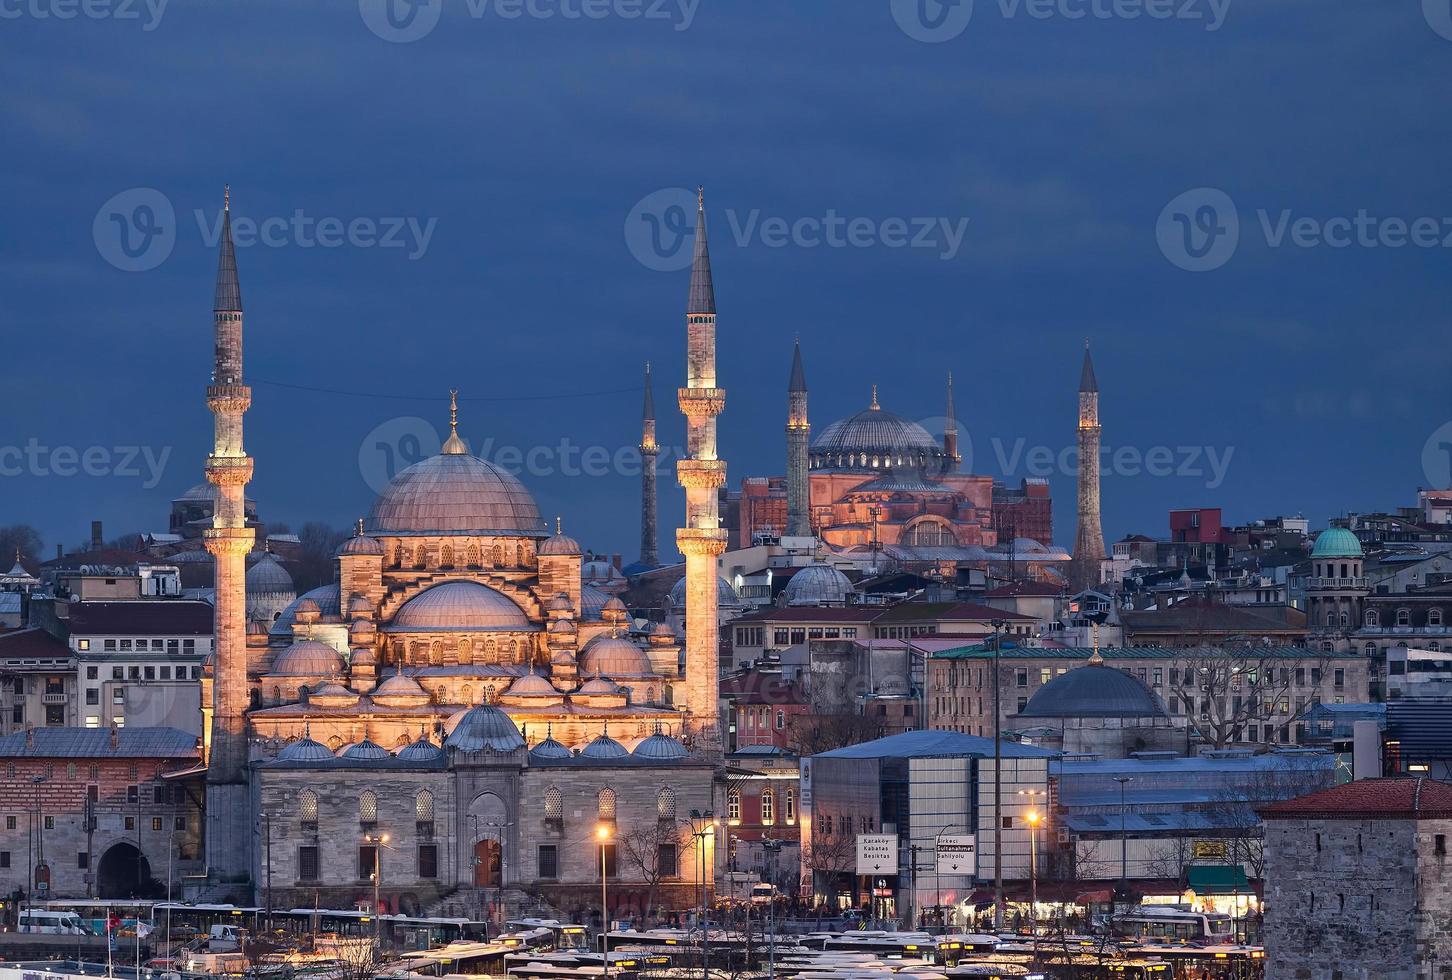 New mosque and Hagia Sophia photo